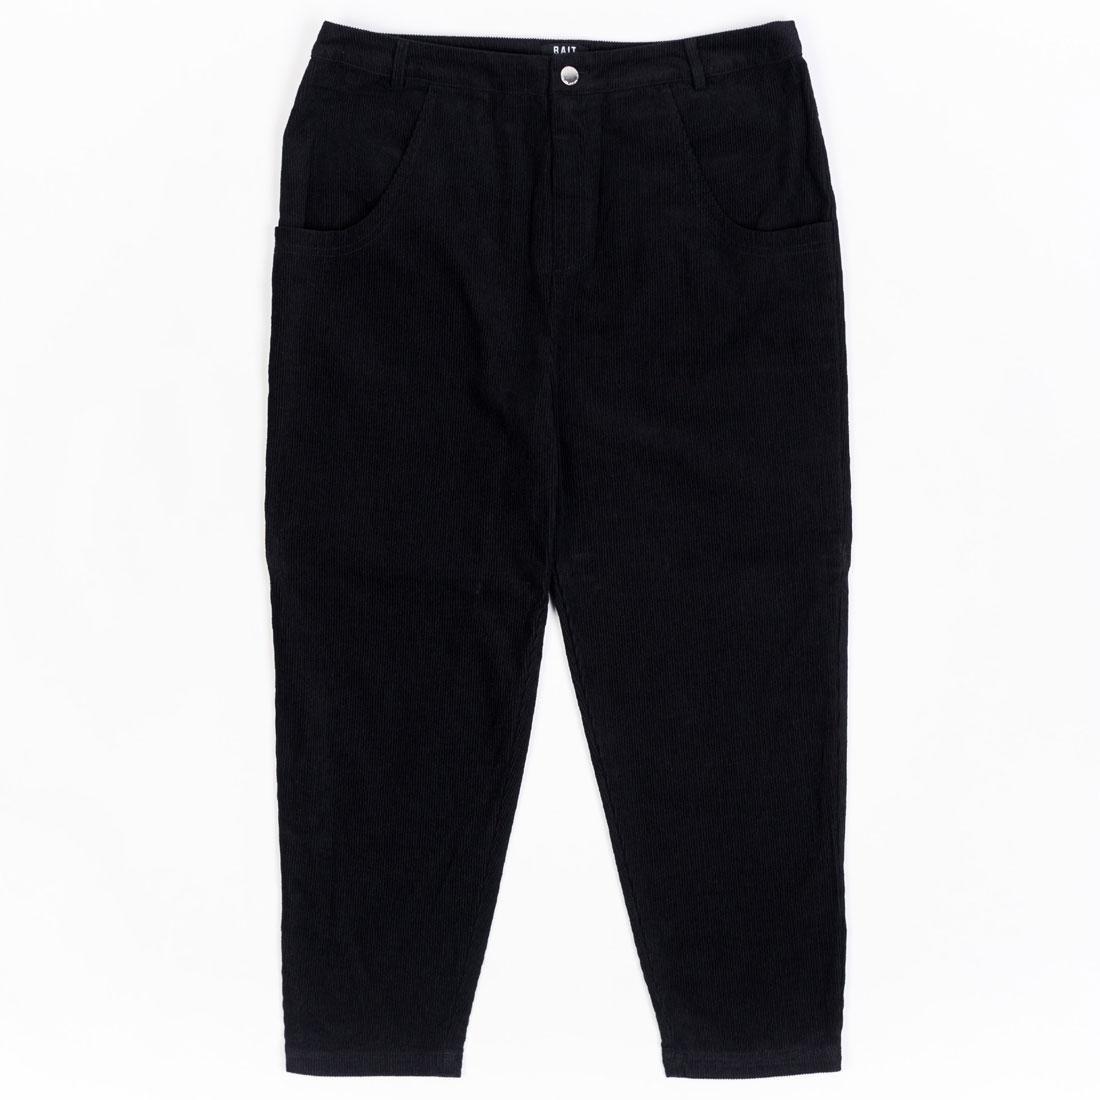 BAIT Unisex Corduroy Tailored Pants (black)